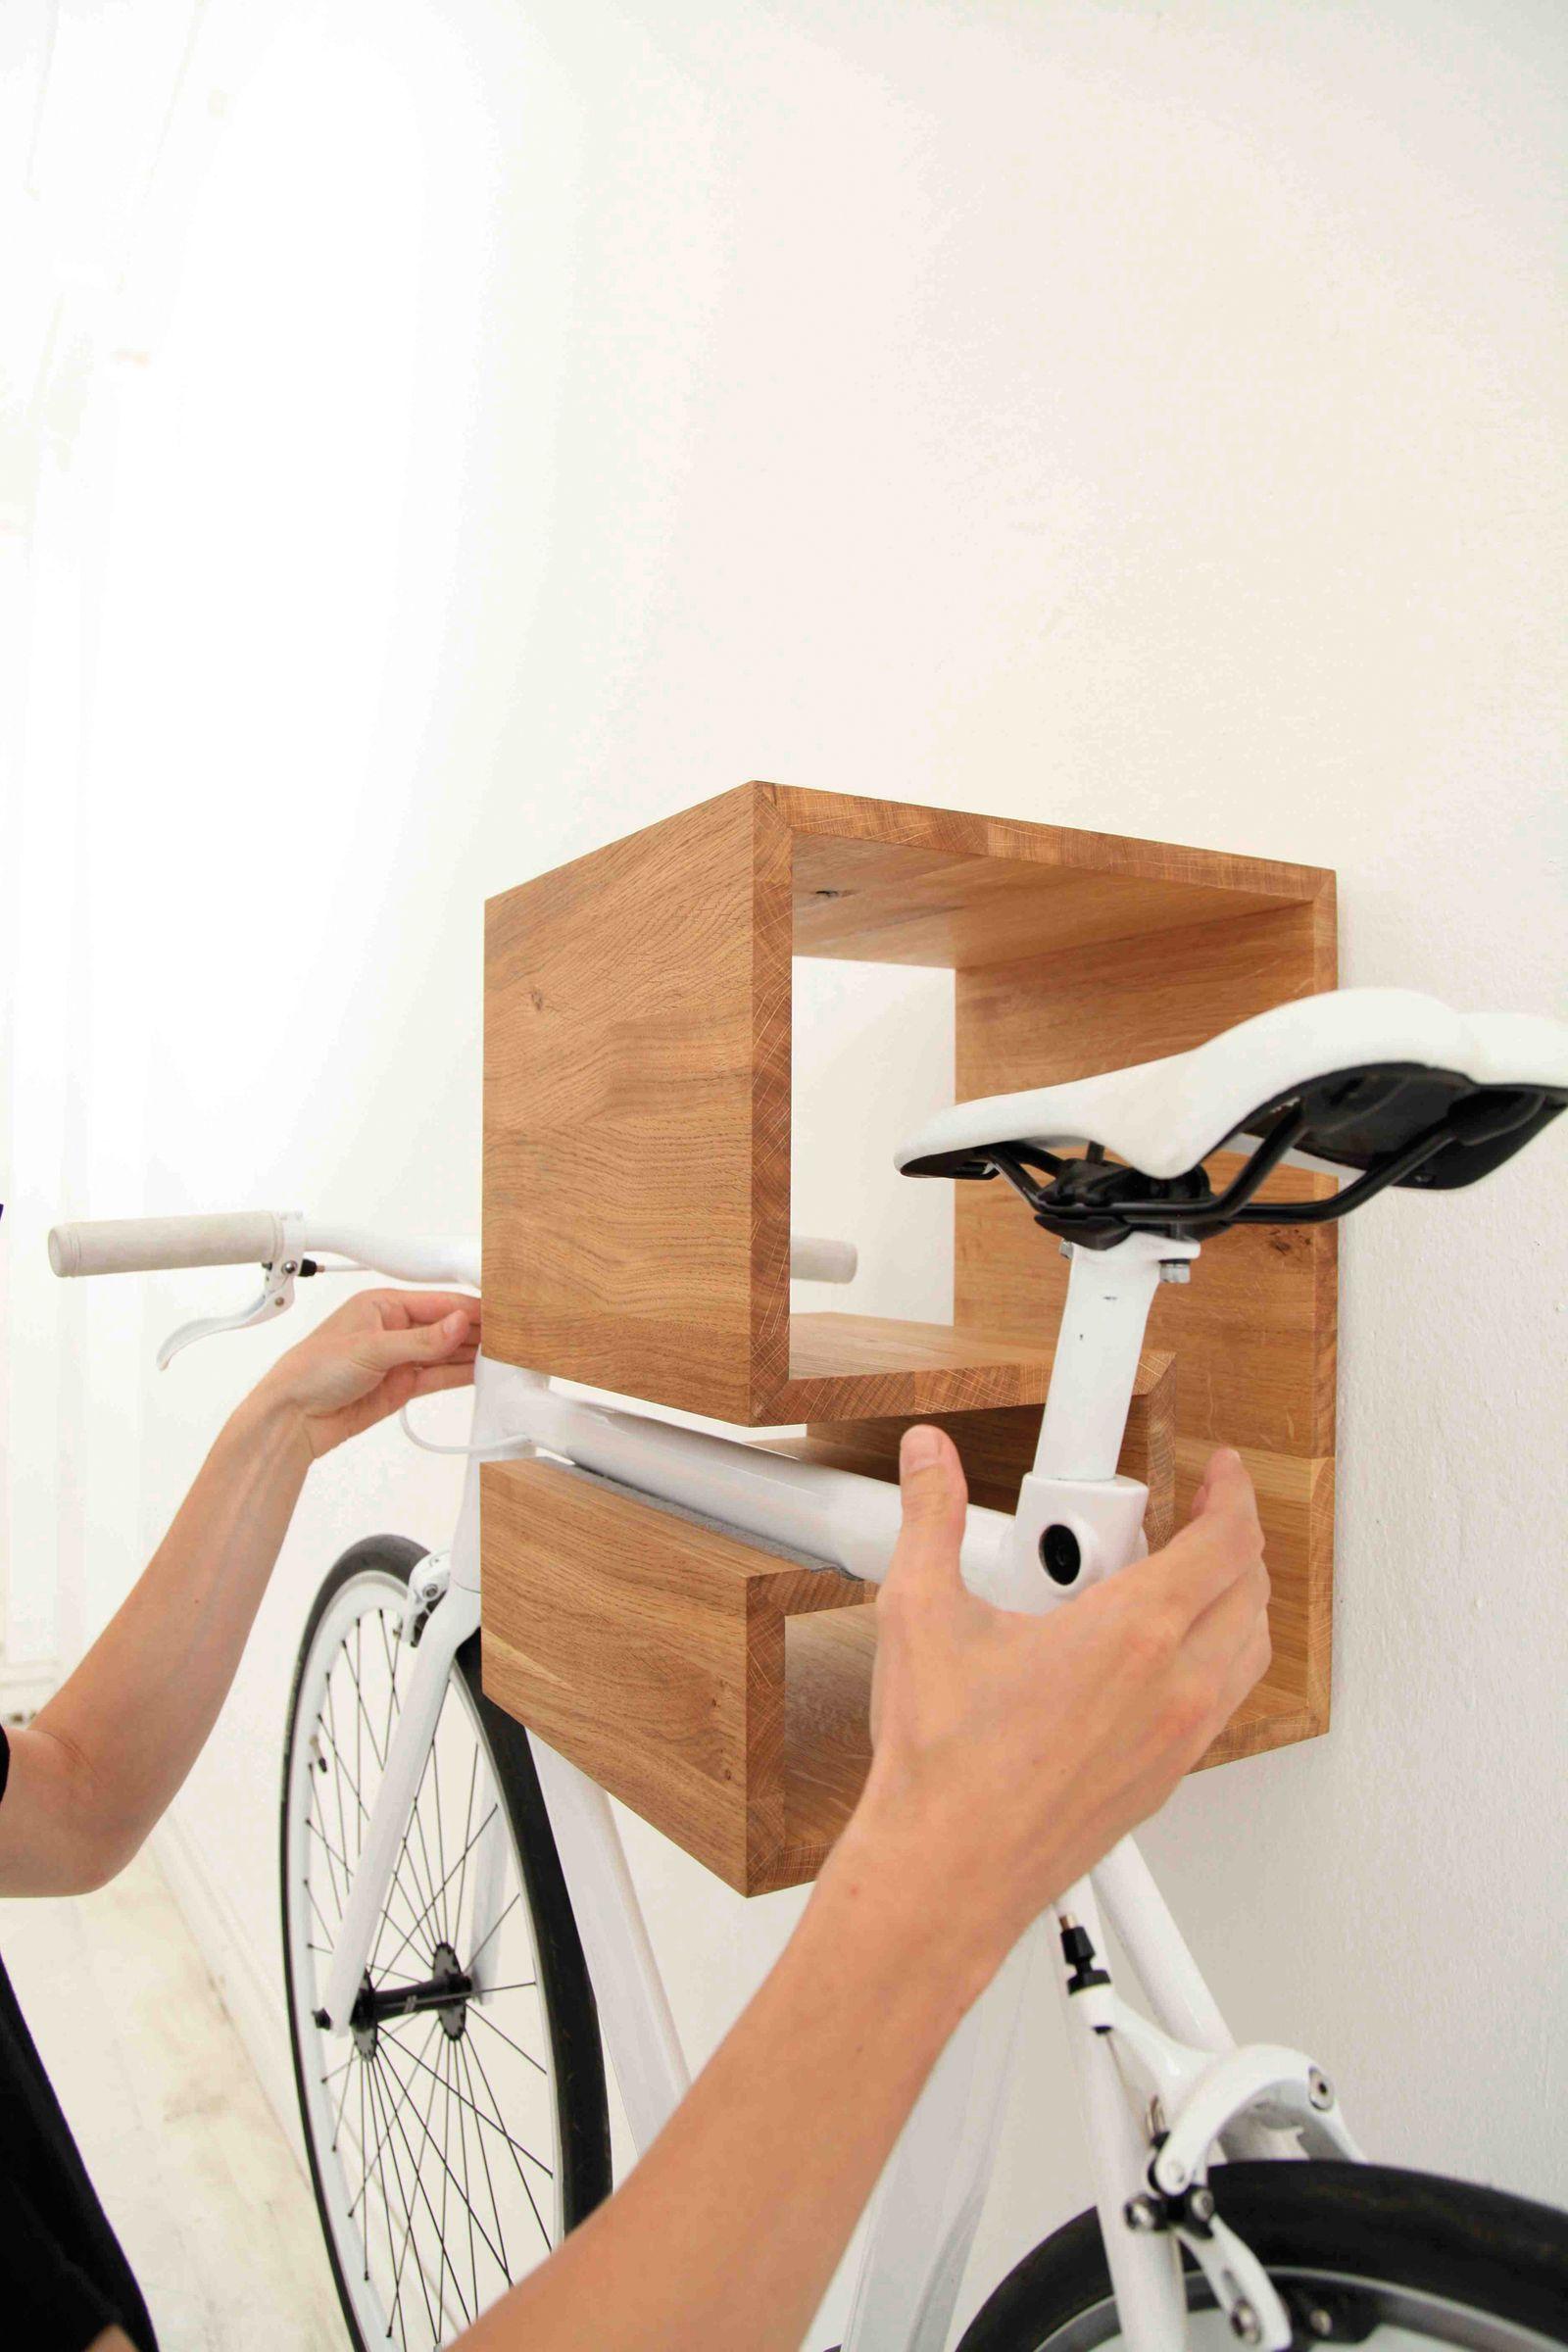 Fahrradregal / Bicycle Furniture